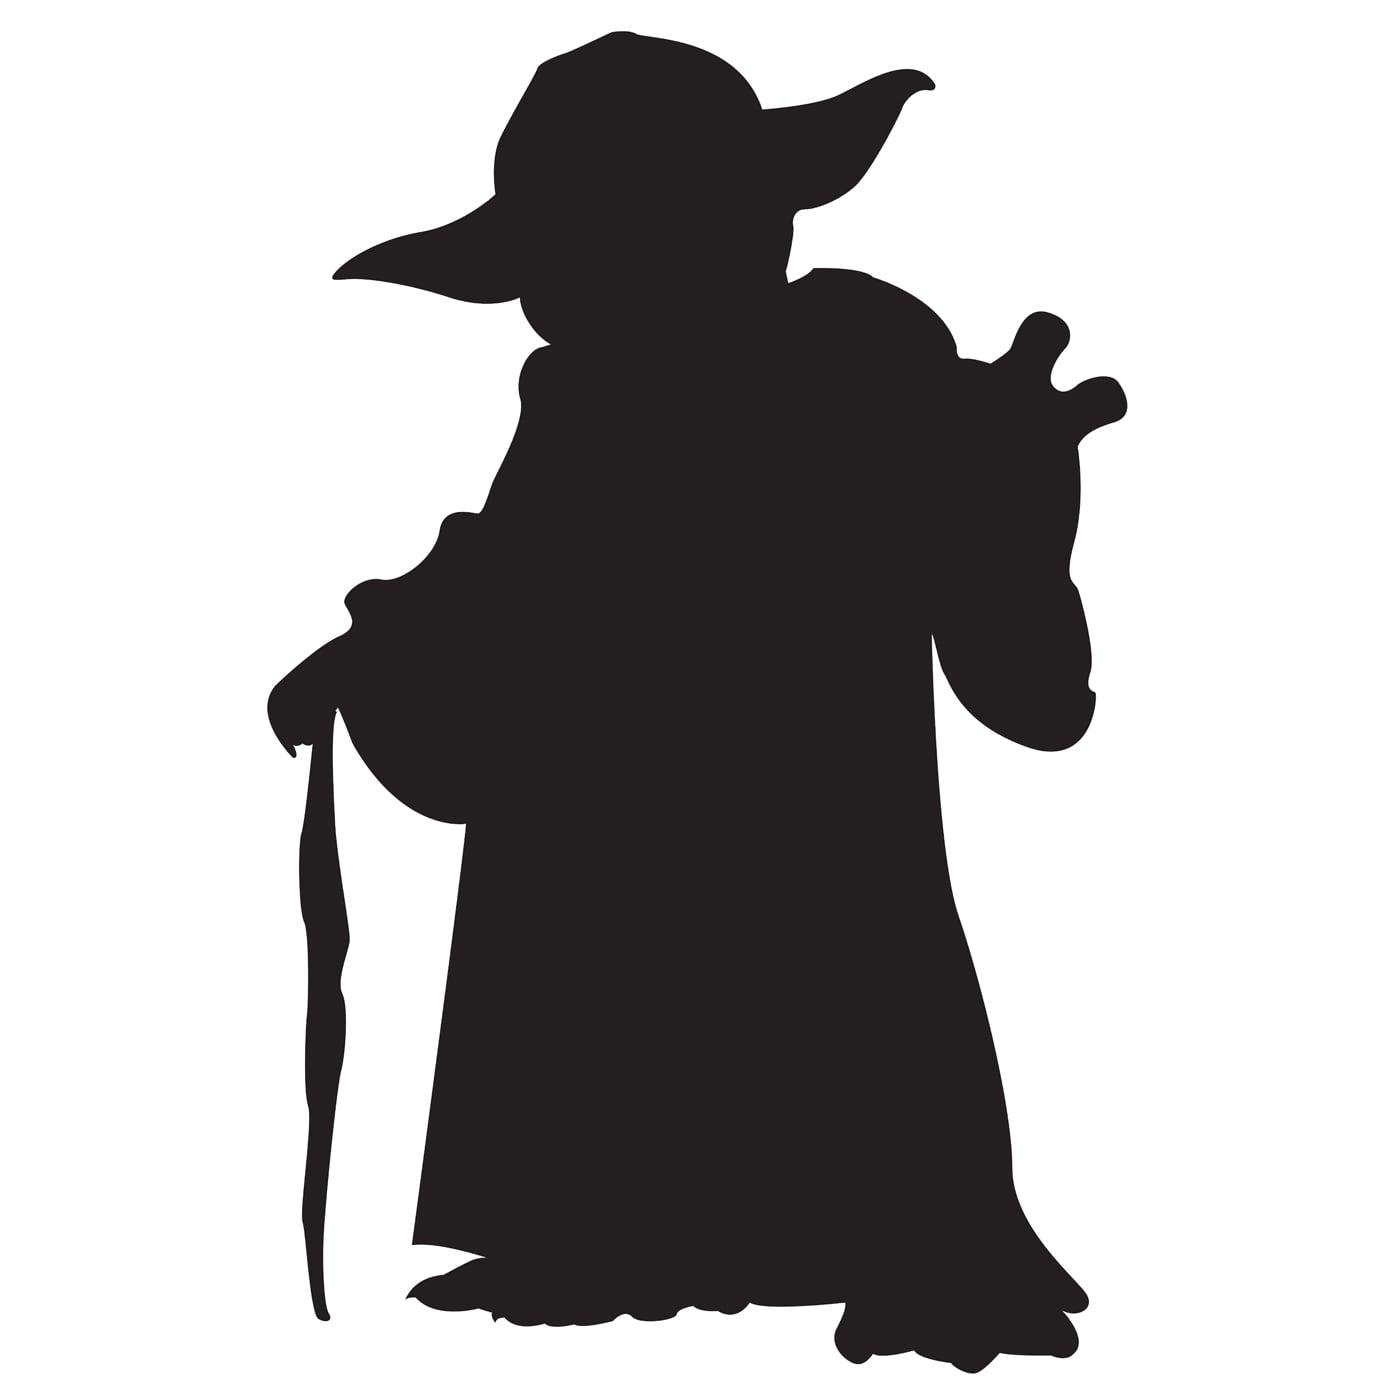 yoda pumpkin template  Yoda Pumpkin Template | These Star Wars Pumpkin Templates ...